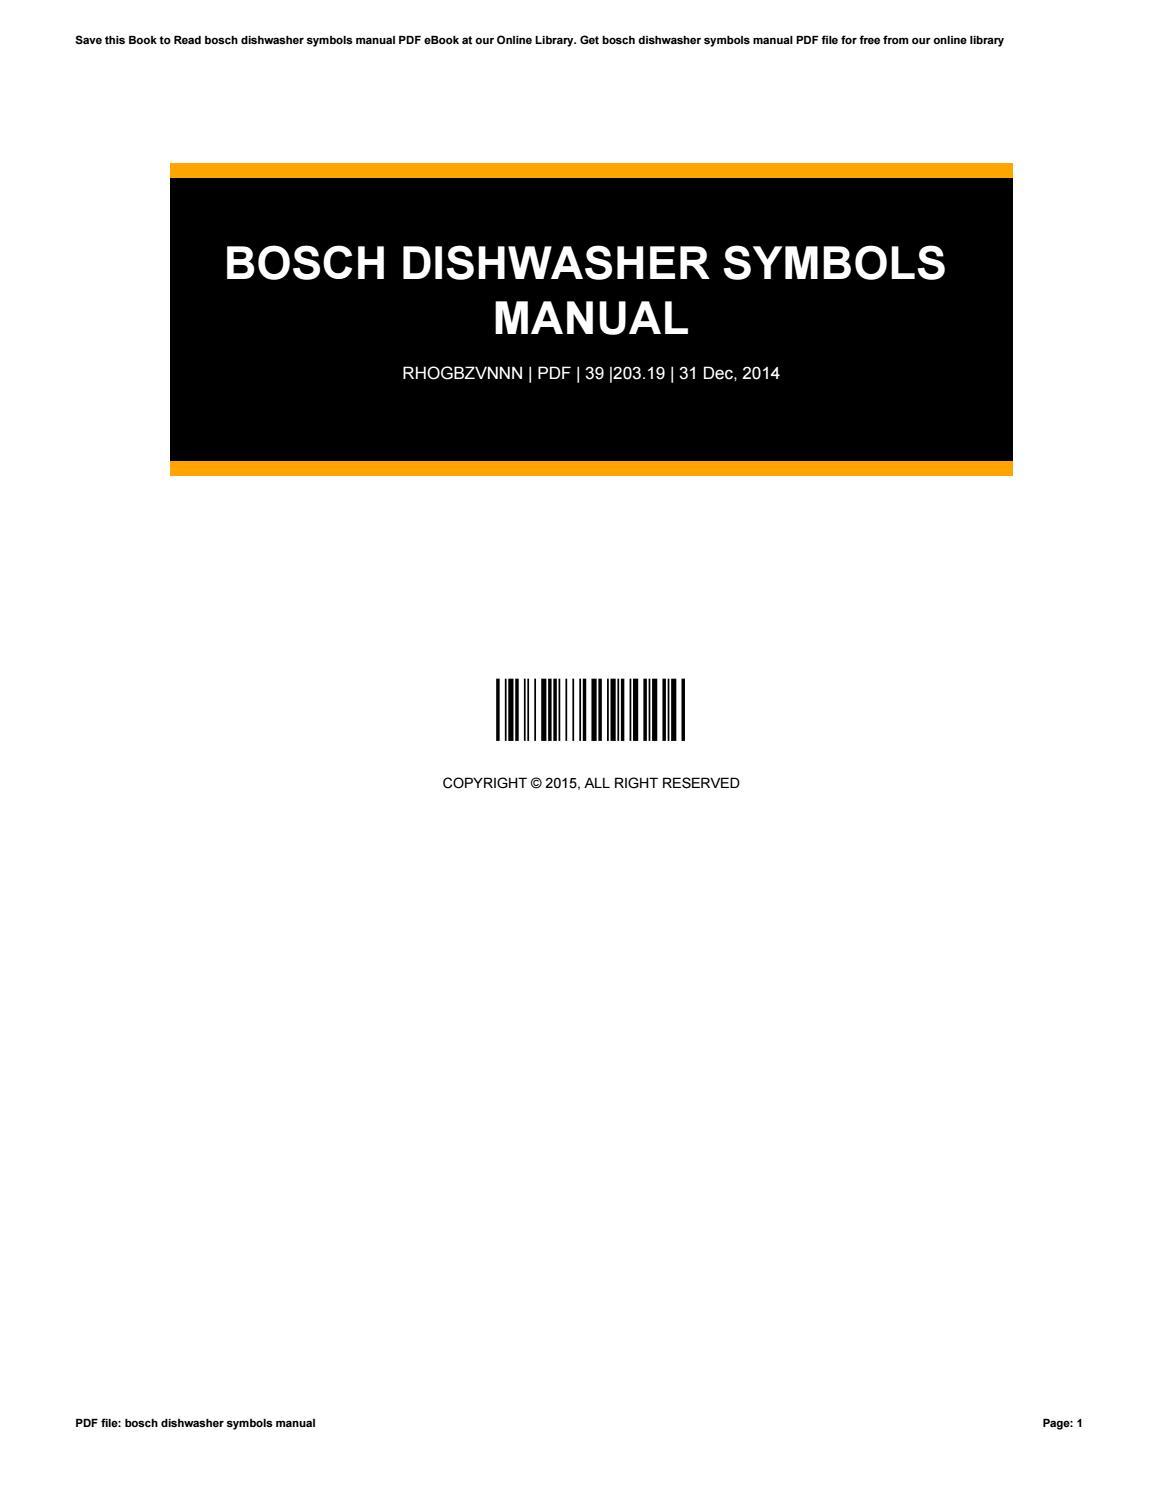 Bosch dishwasher manual symbols wikishare bosch dishwasher symbols buycottarizona Gallery